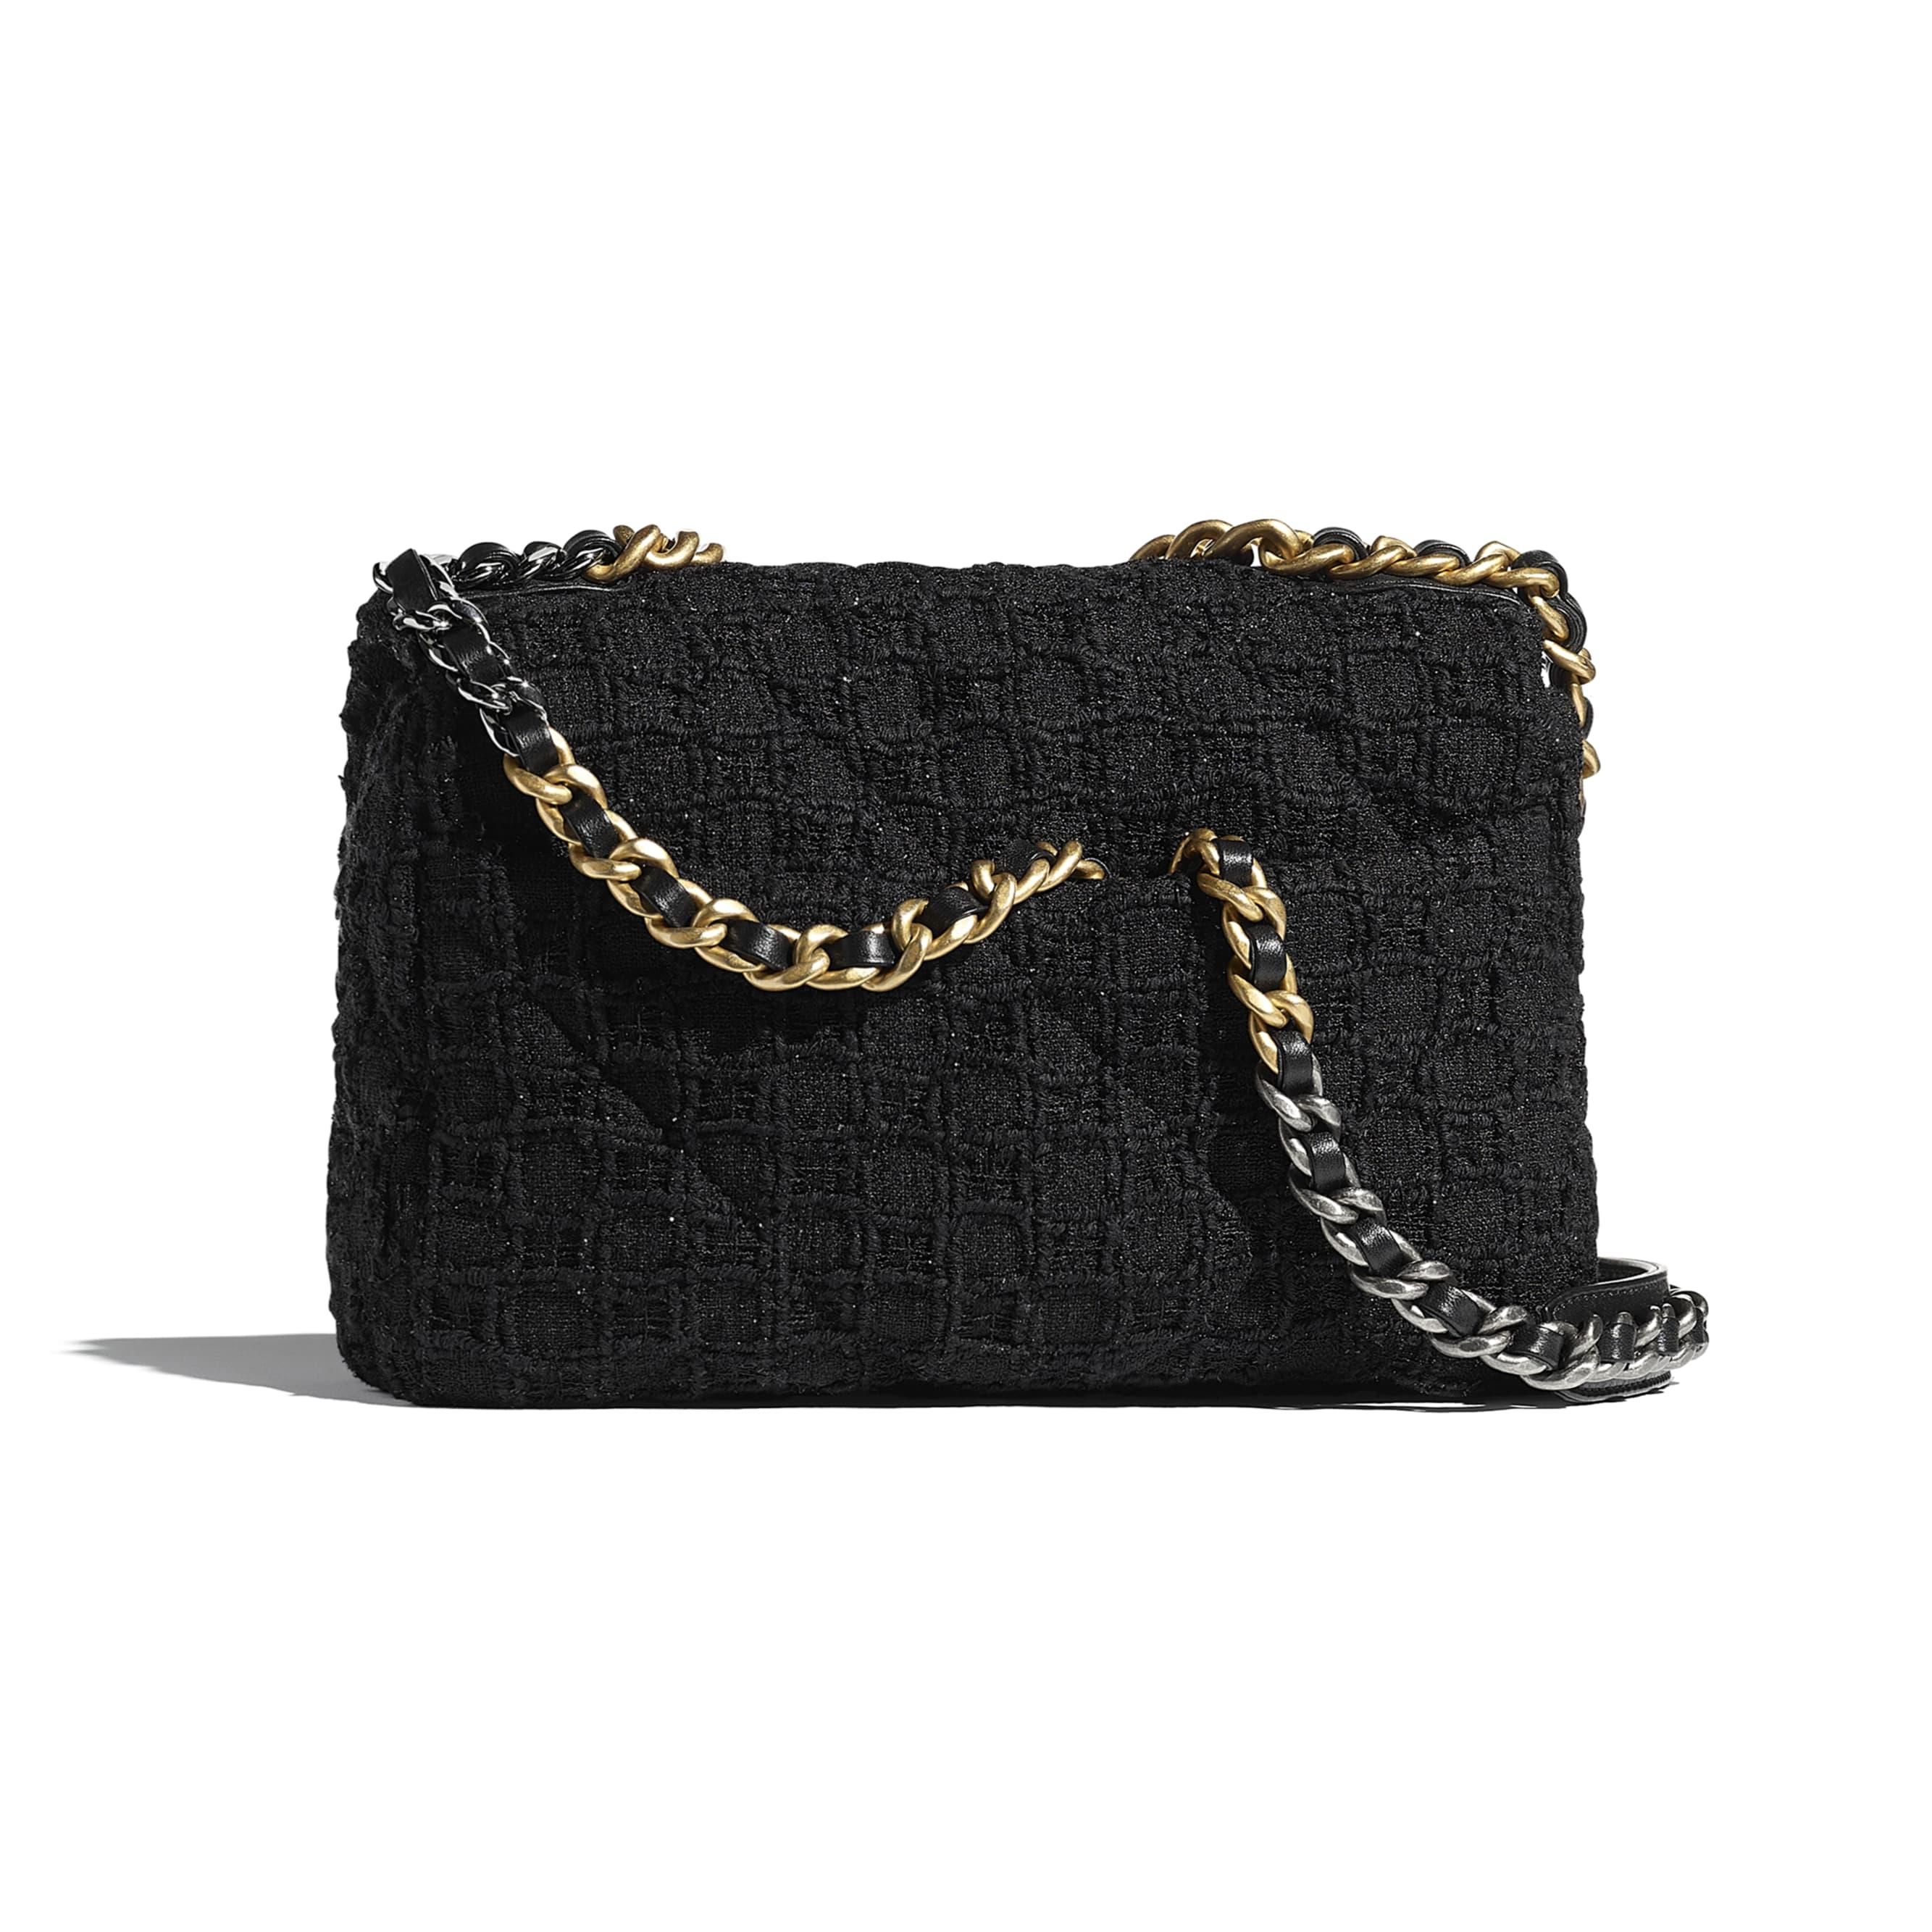 CHANEL 19 Handbag - Black - Tweed, Gold-Tone, Silver-Tone & Ruthenium-Finish Metal - CHANEL - Alternative view - see standard sized version